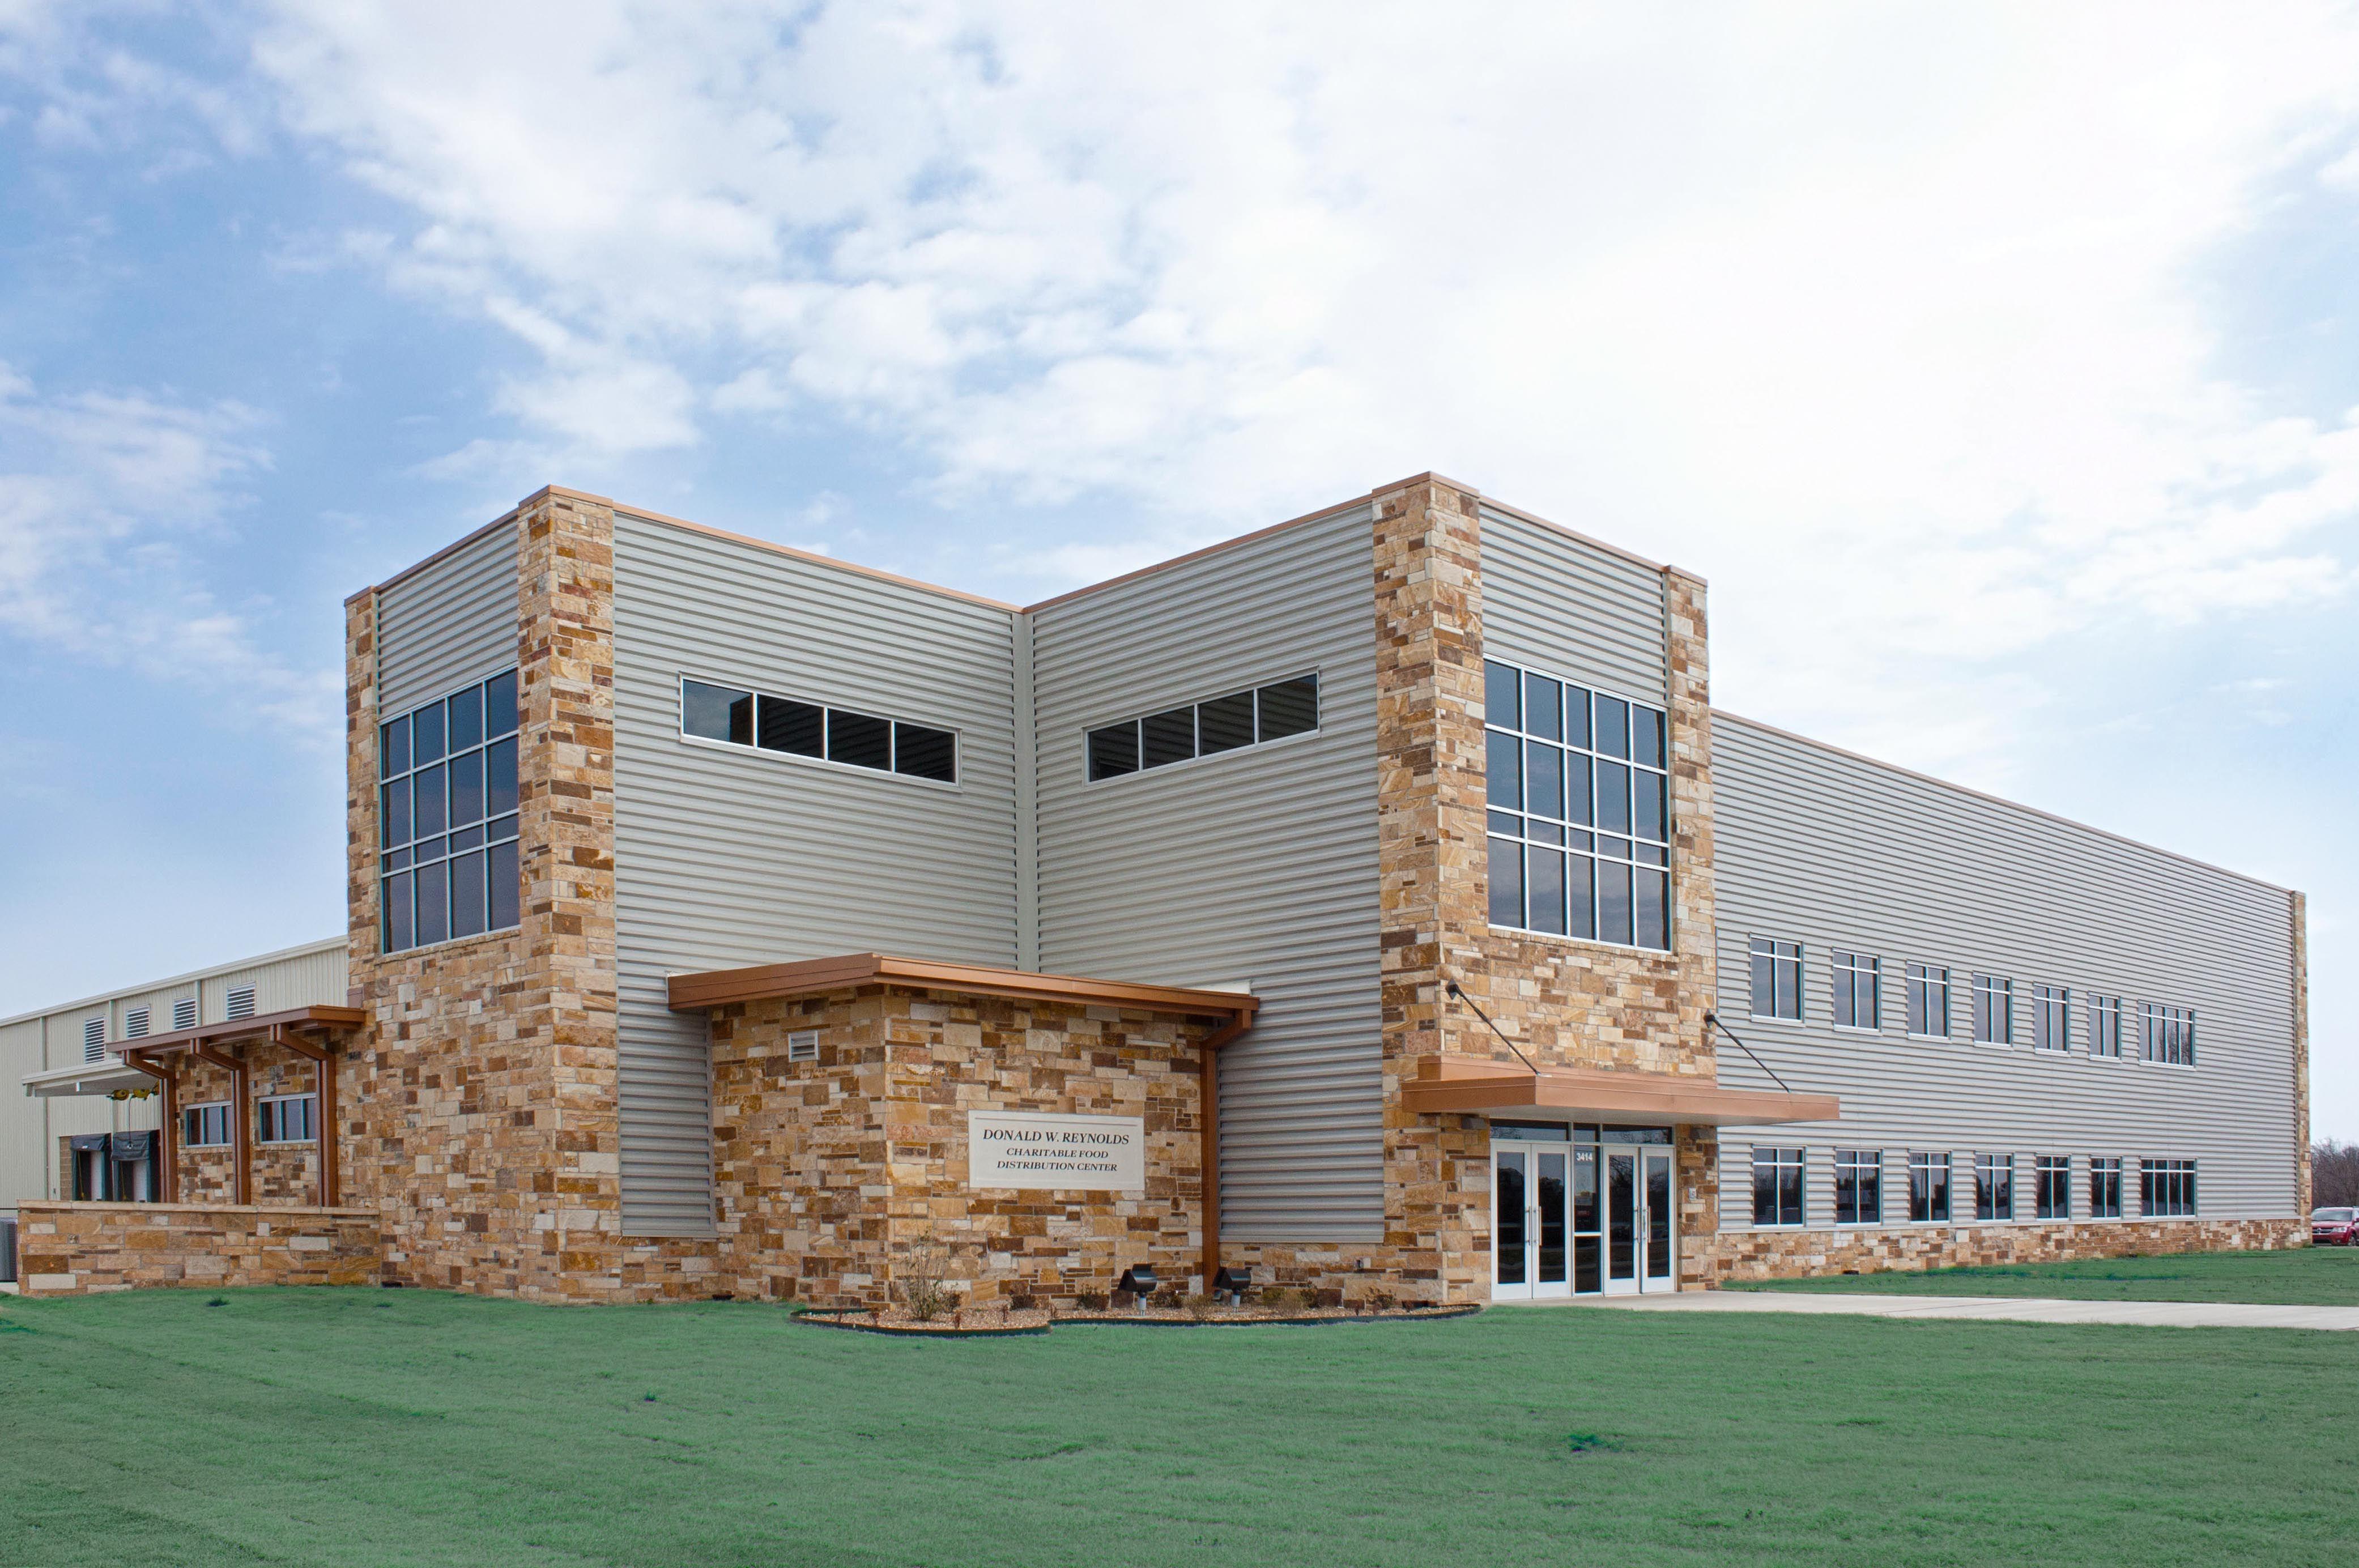 Northeast Arkansas Food Bank Jonesboro Ar Http Www Facebook Com Cssarchitecture